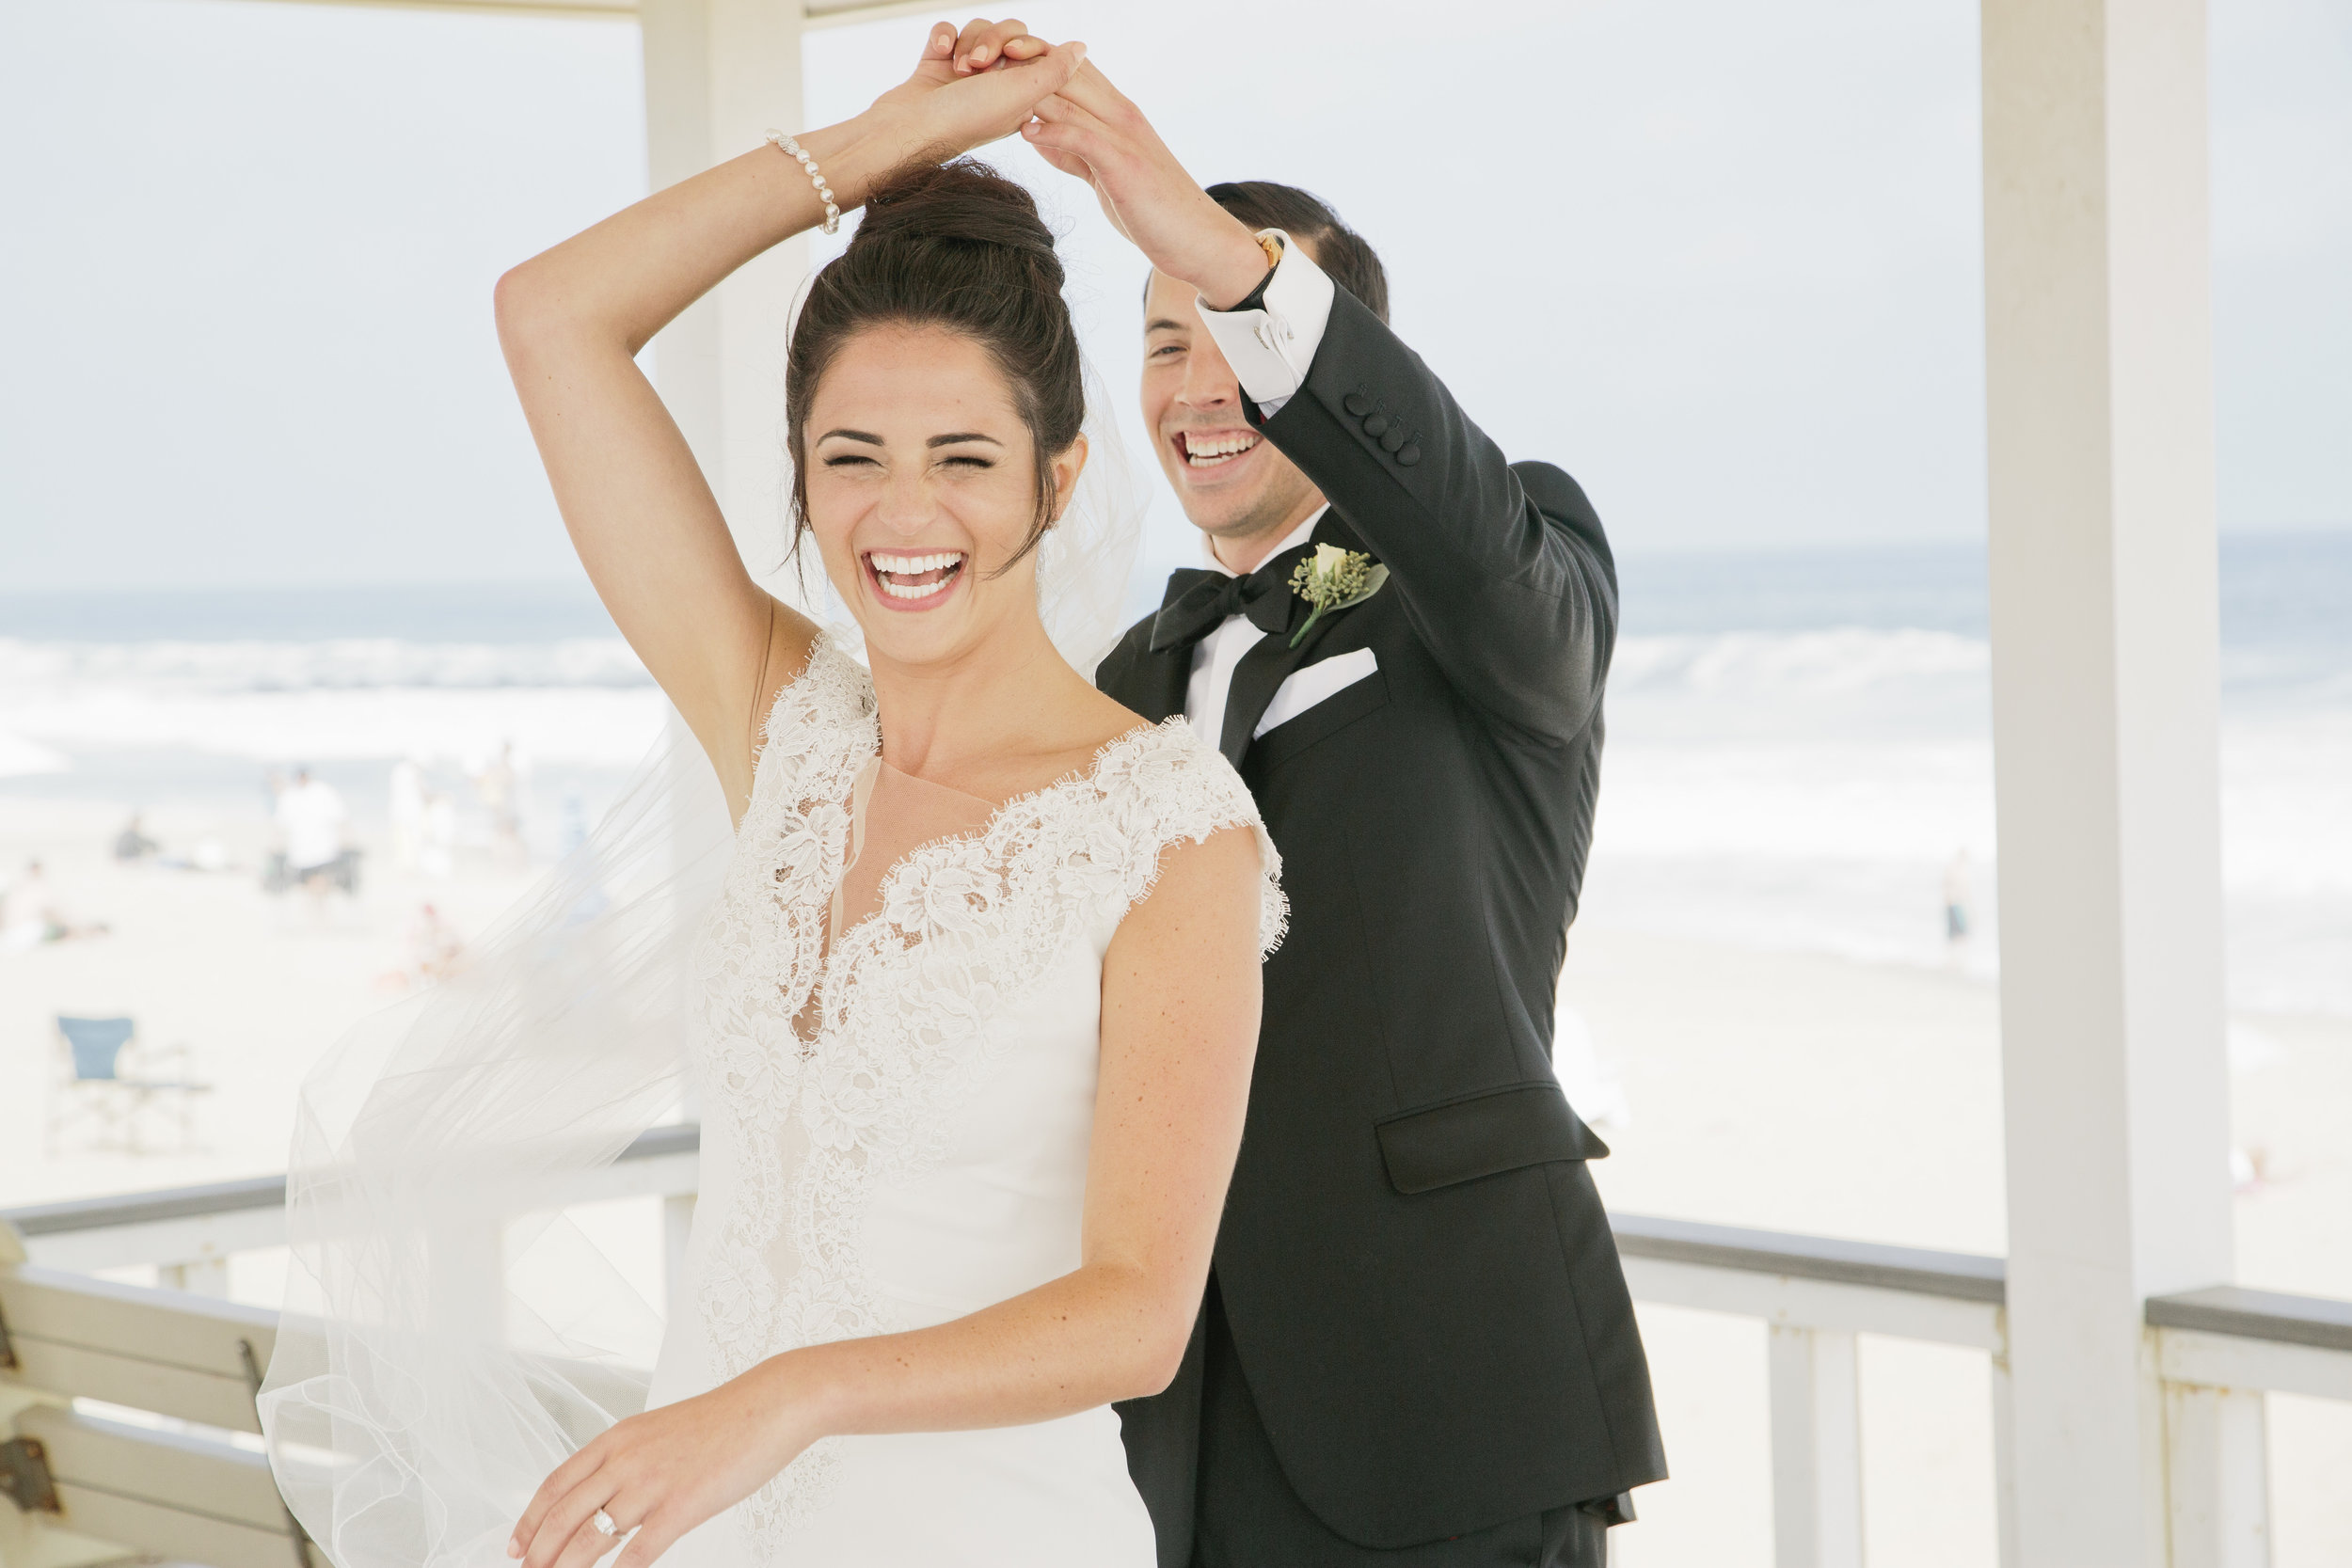 Spring-Lake-New-Jersey-Beach-Wedding-Photographer_100.jpg